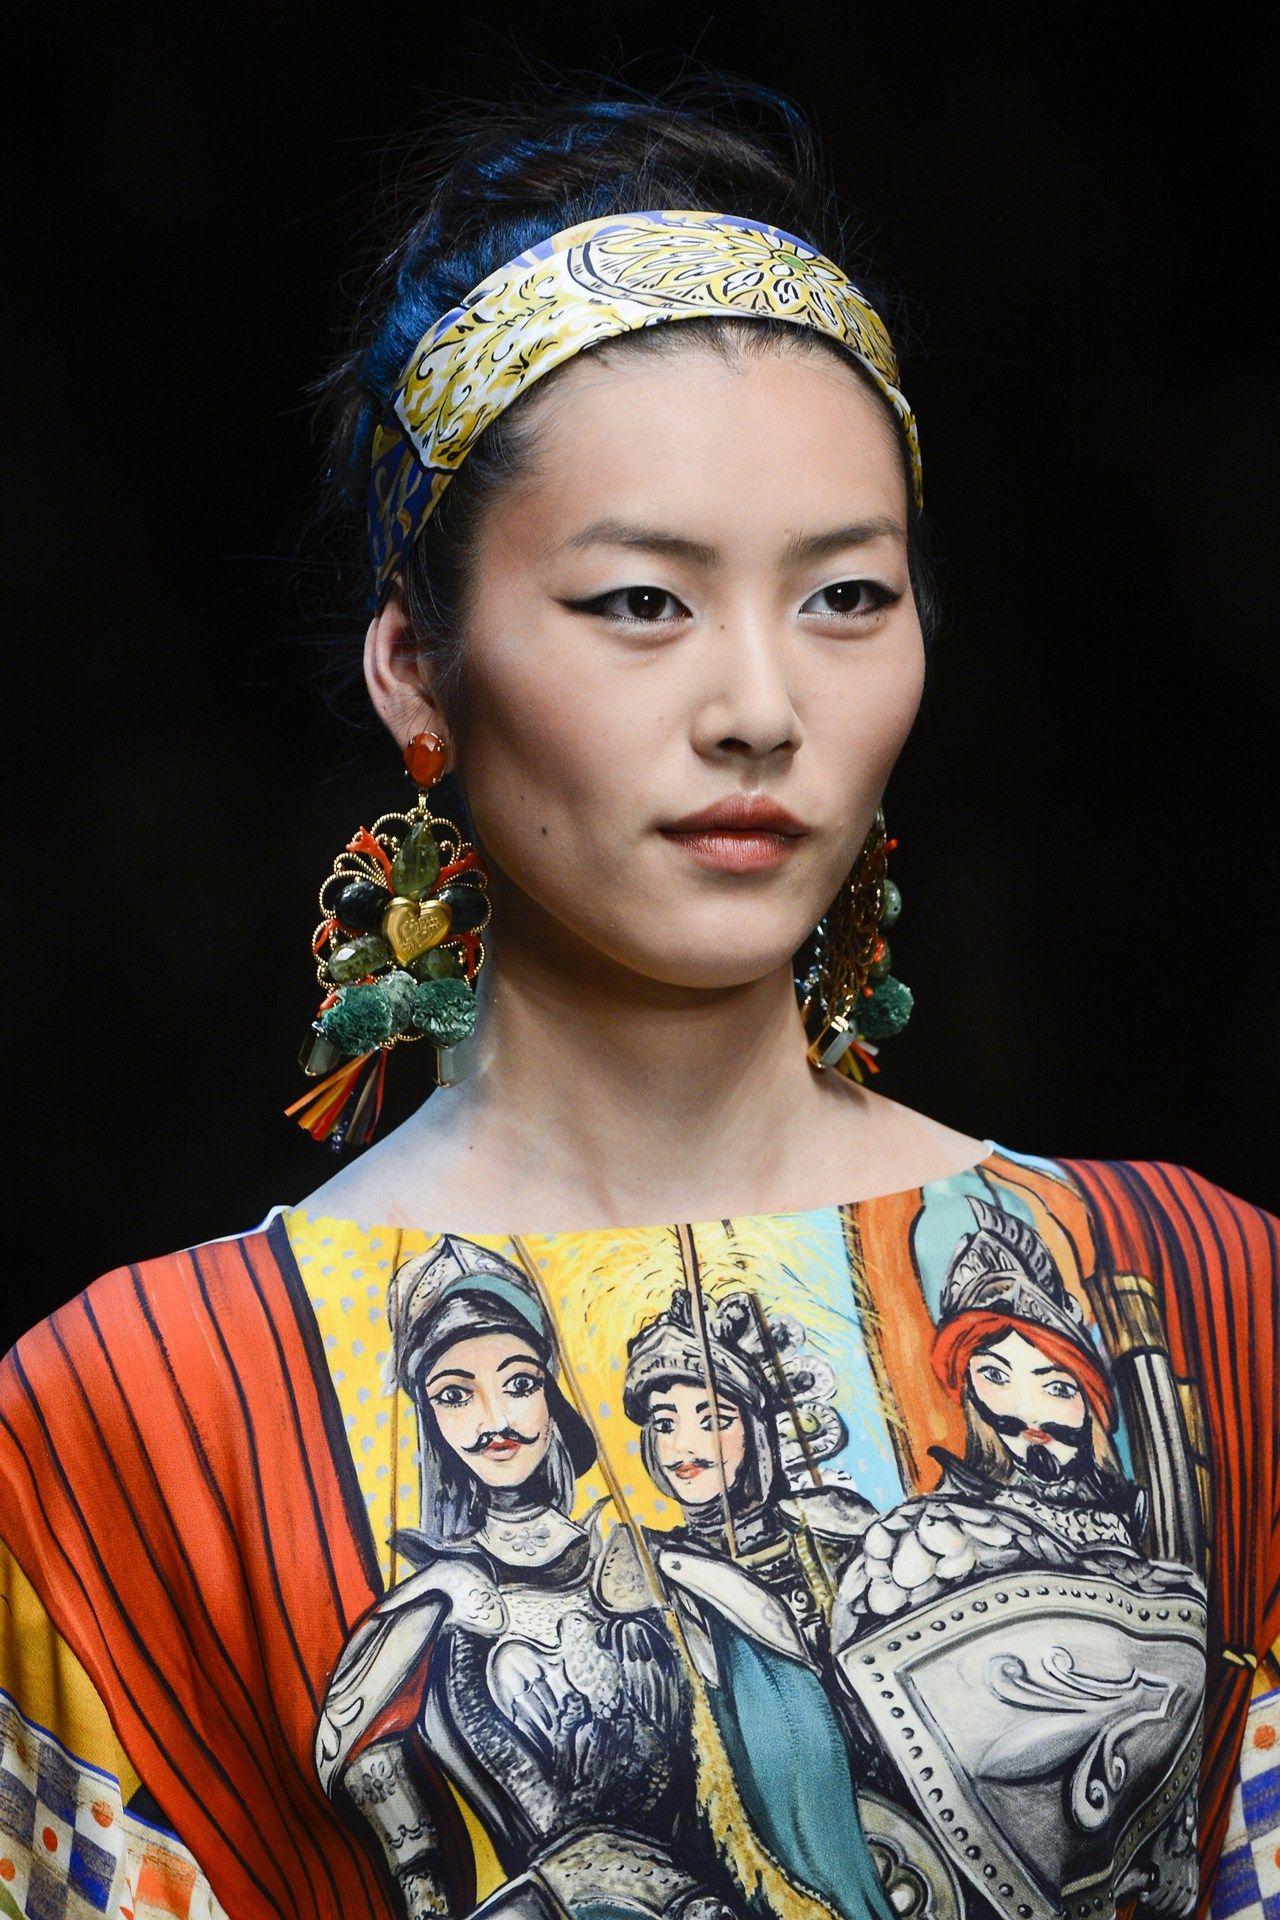 Liu Wen at Dolce & Gabbana Spring/Summer 2013